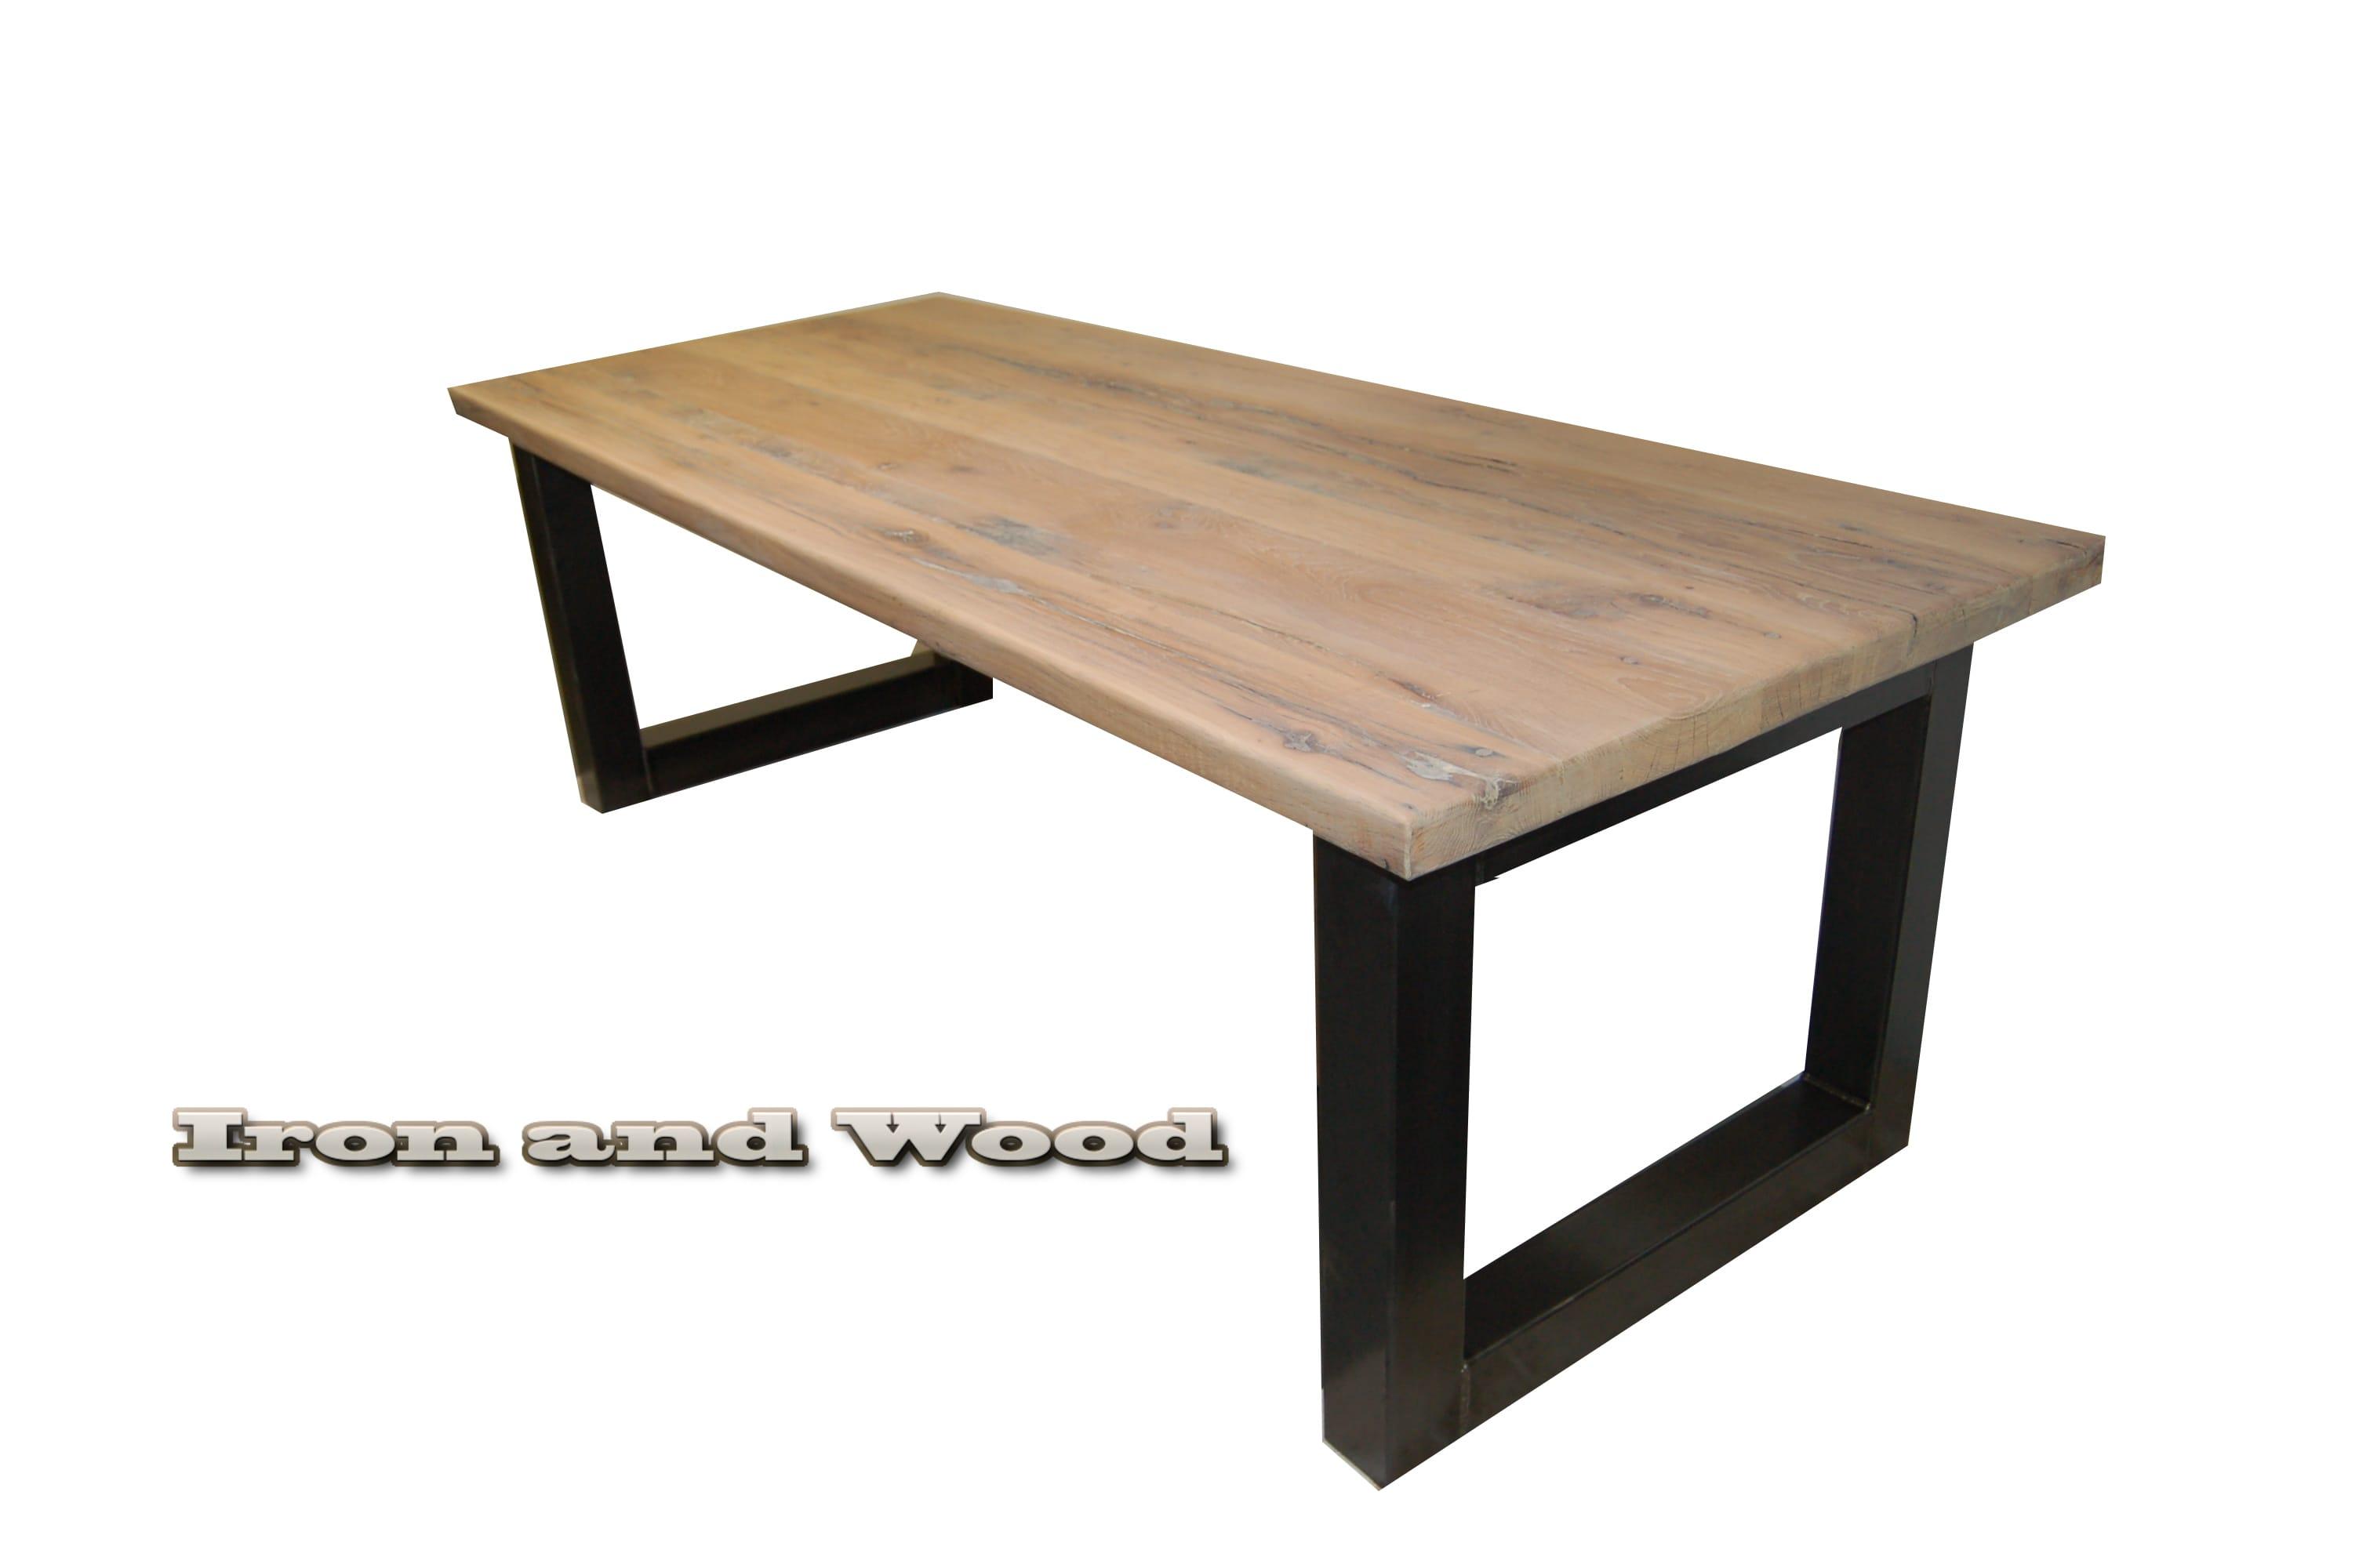 Industriele Tafel Eettafel.Industriele Stalen Tafel Met Kubuspoot En Oude Eiken Wagondelen